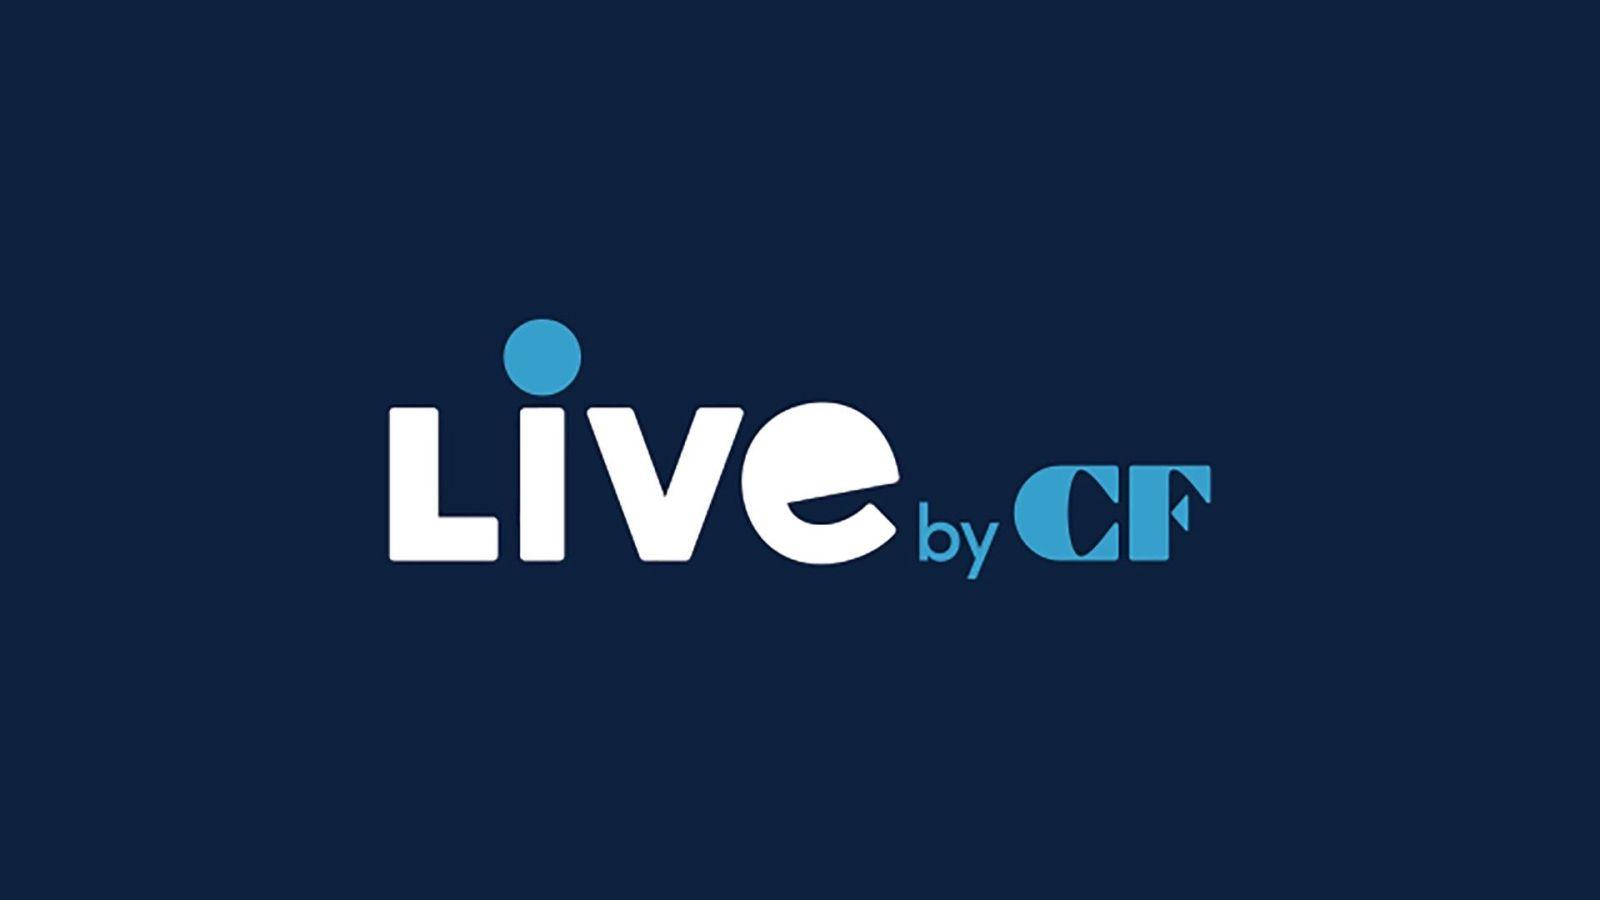 [CF Rideau Centre] - LiVE by CF